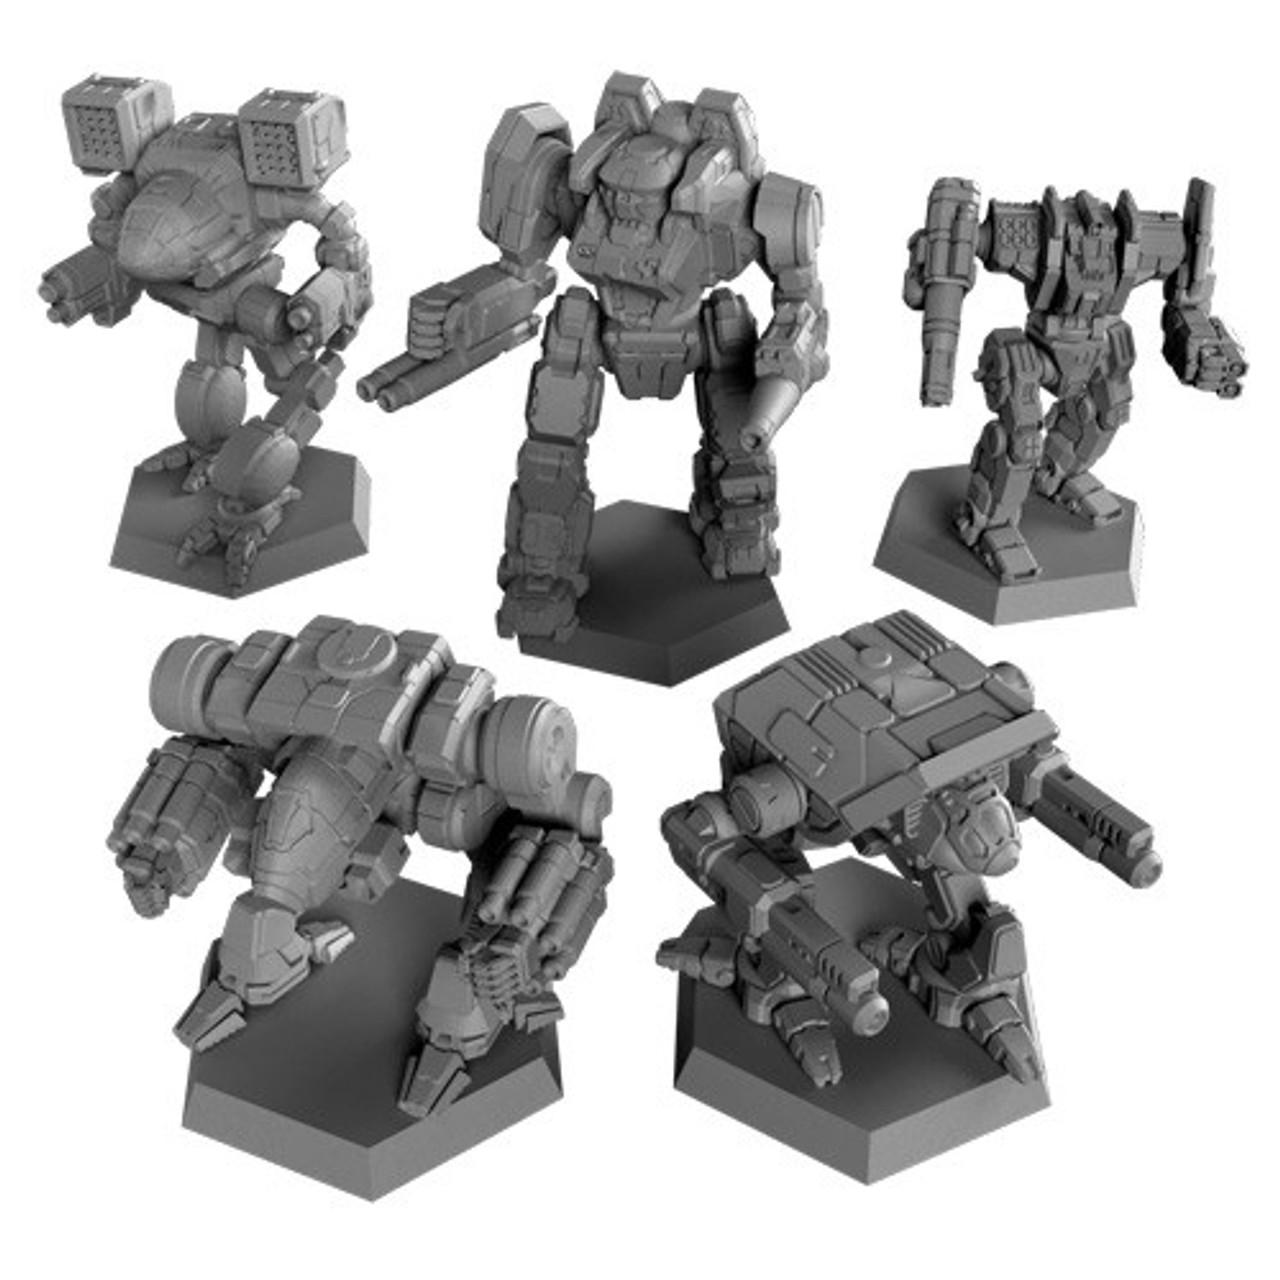 Battletech: Clan Invasion Expansion Set